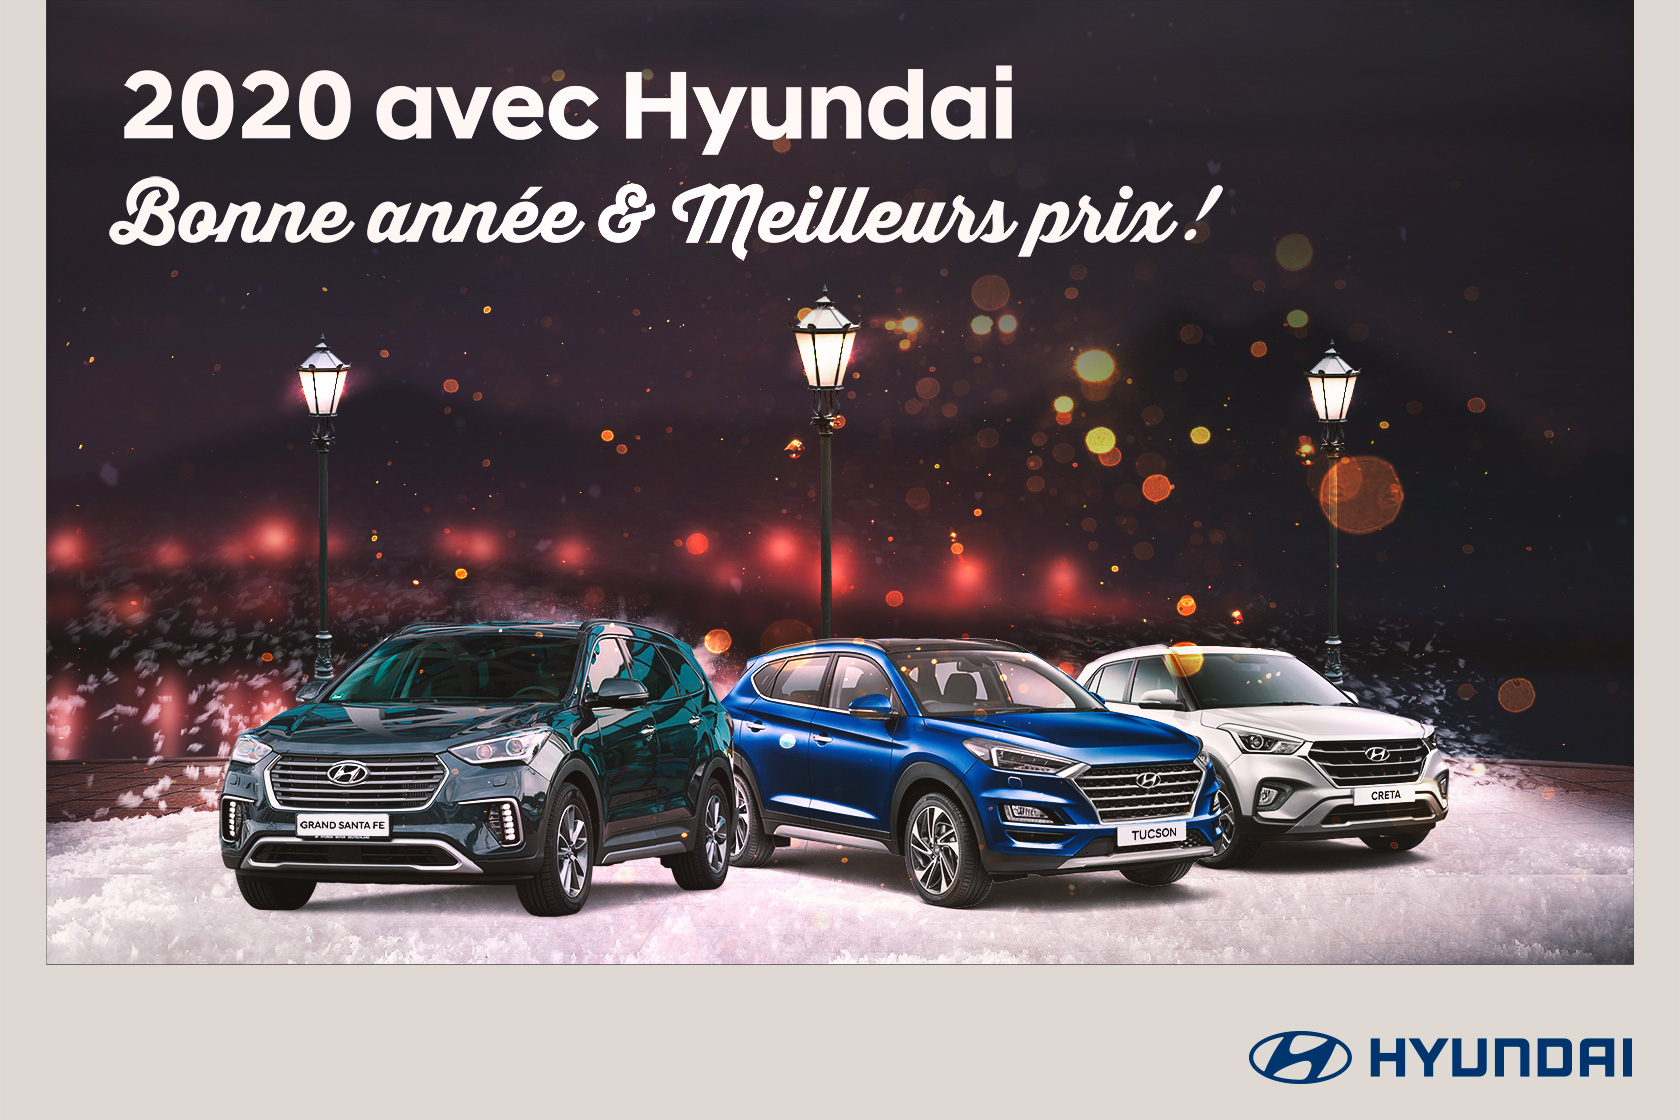 2020 avec Hyundai